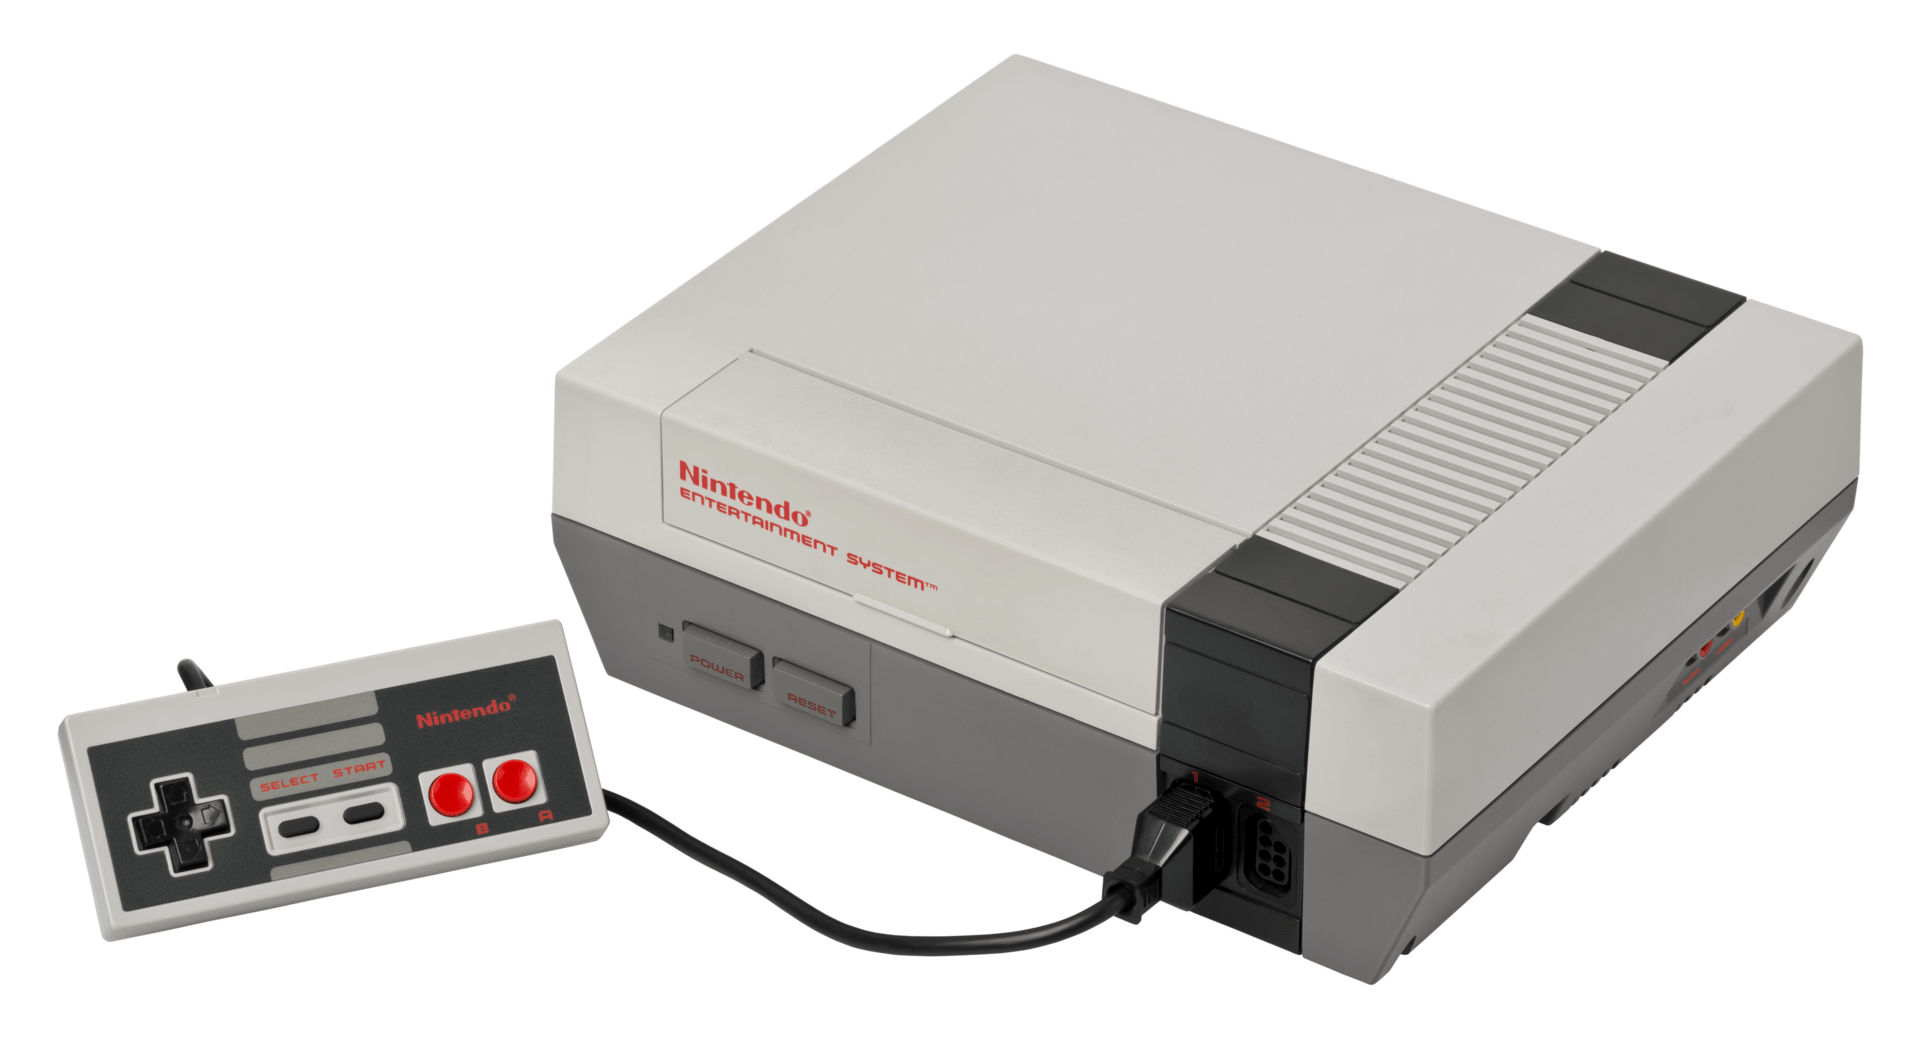 Das Nintendo Entertainment System